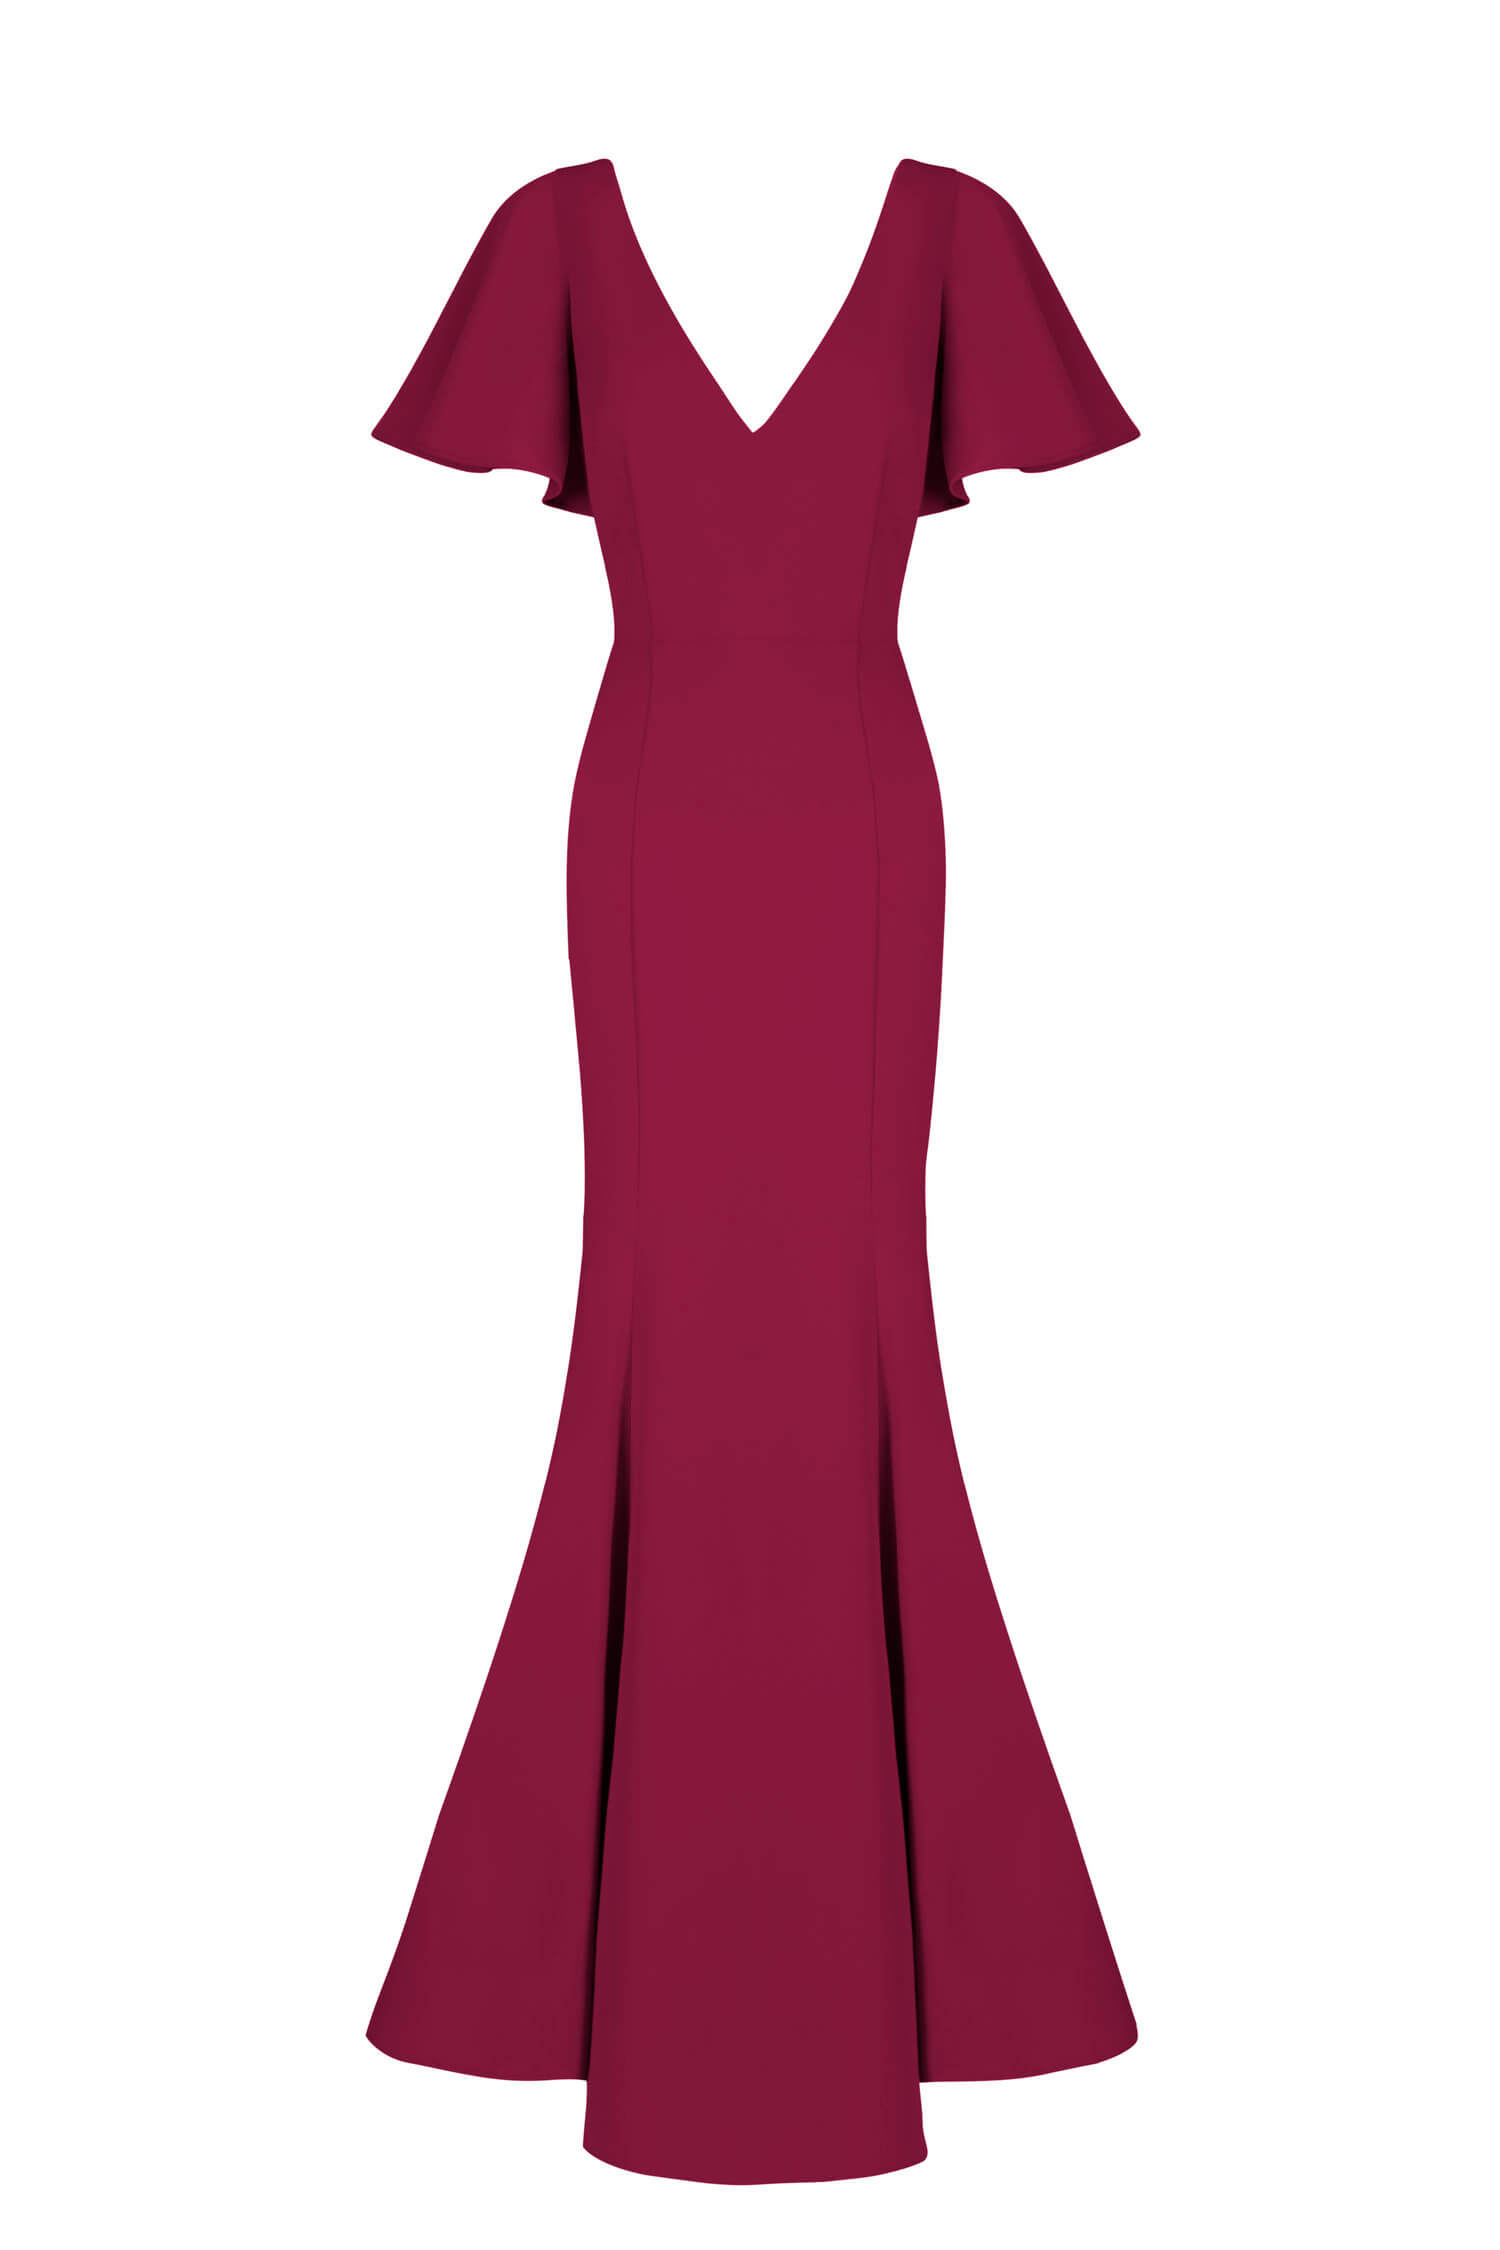 TH&H Celeste Bridesmaid Dress TH&H Bridesmaid Dress Roseberry Burgundy